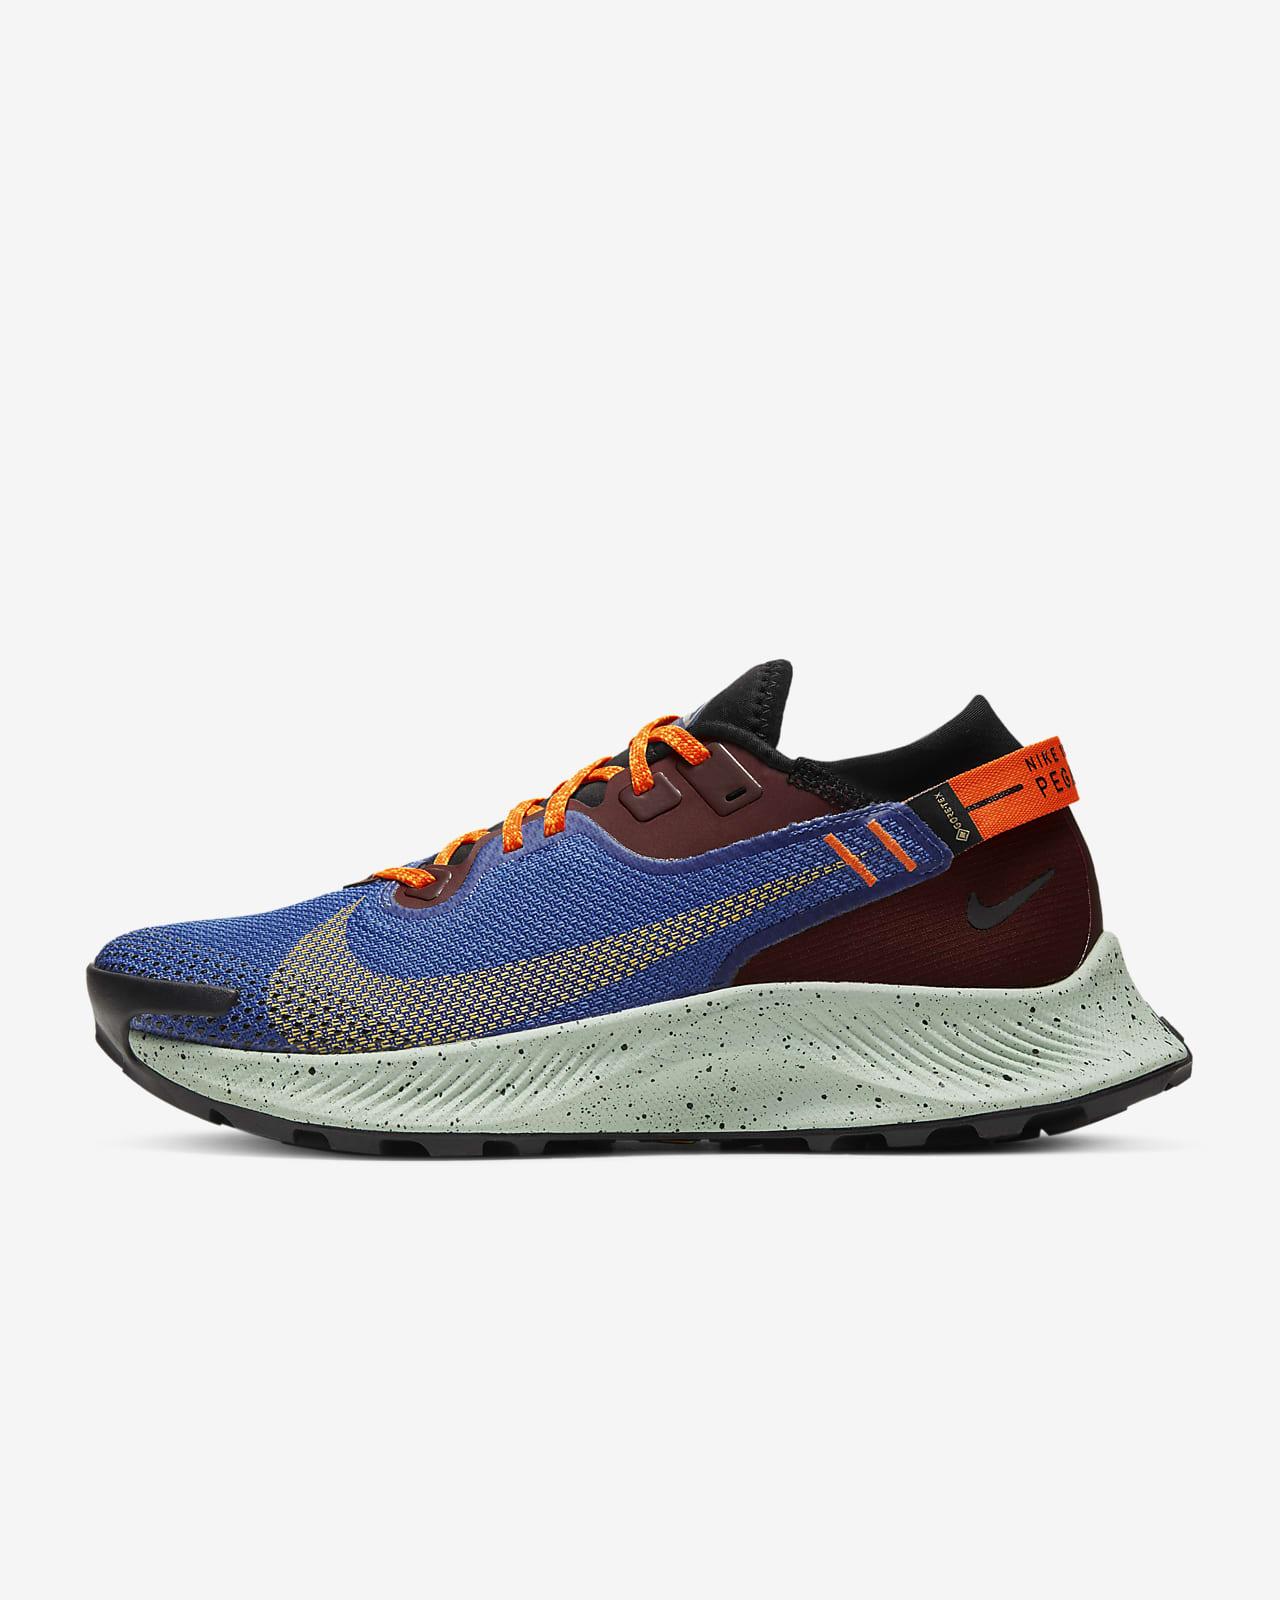 Женские кроссовки для трейлраннинга Nike Pegasus Trail 2 GORE-TEX